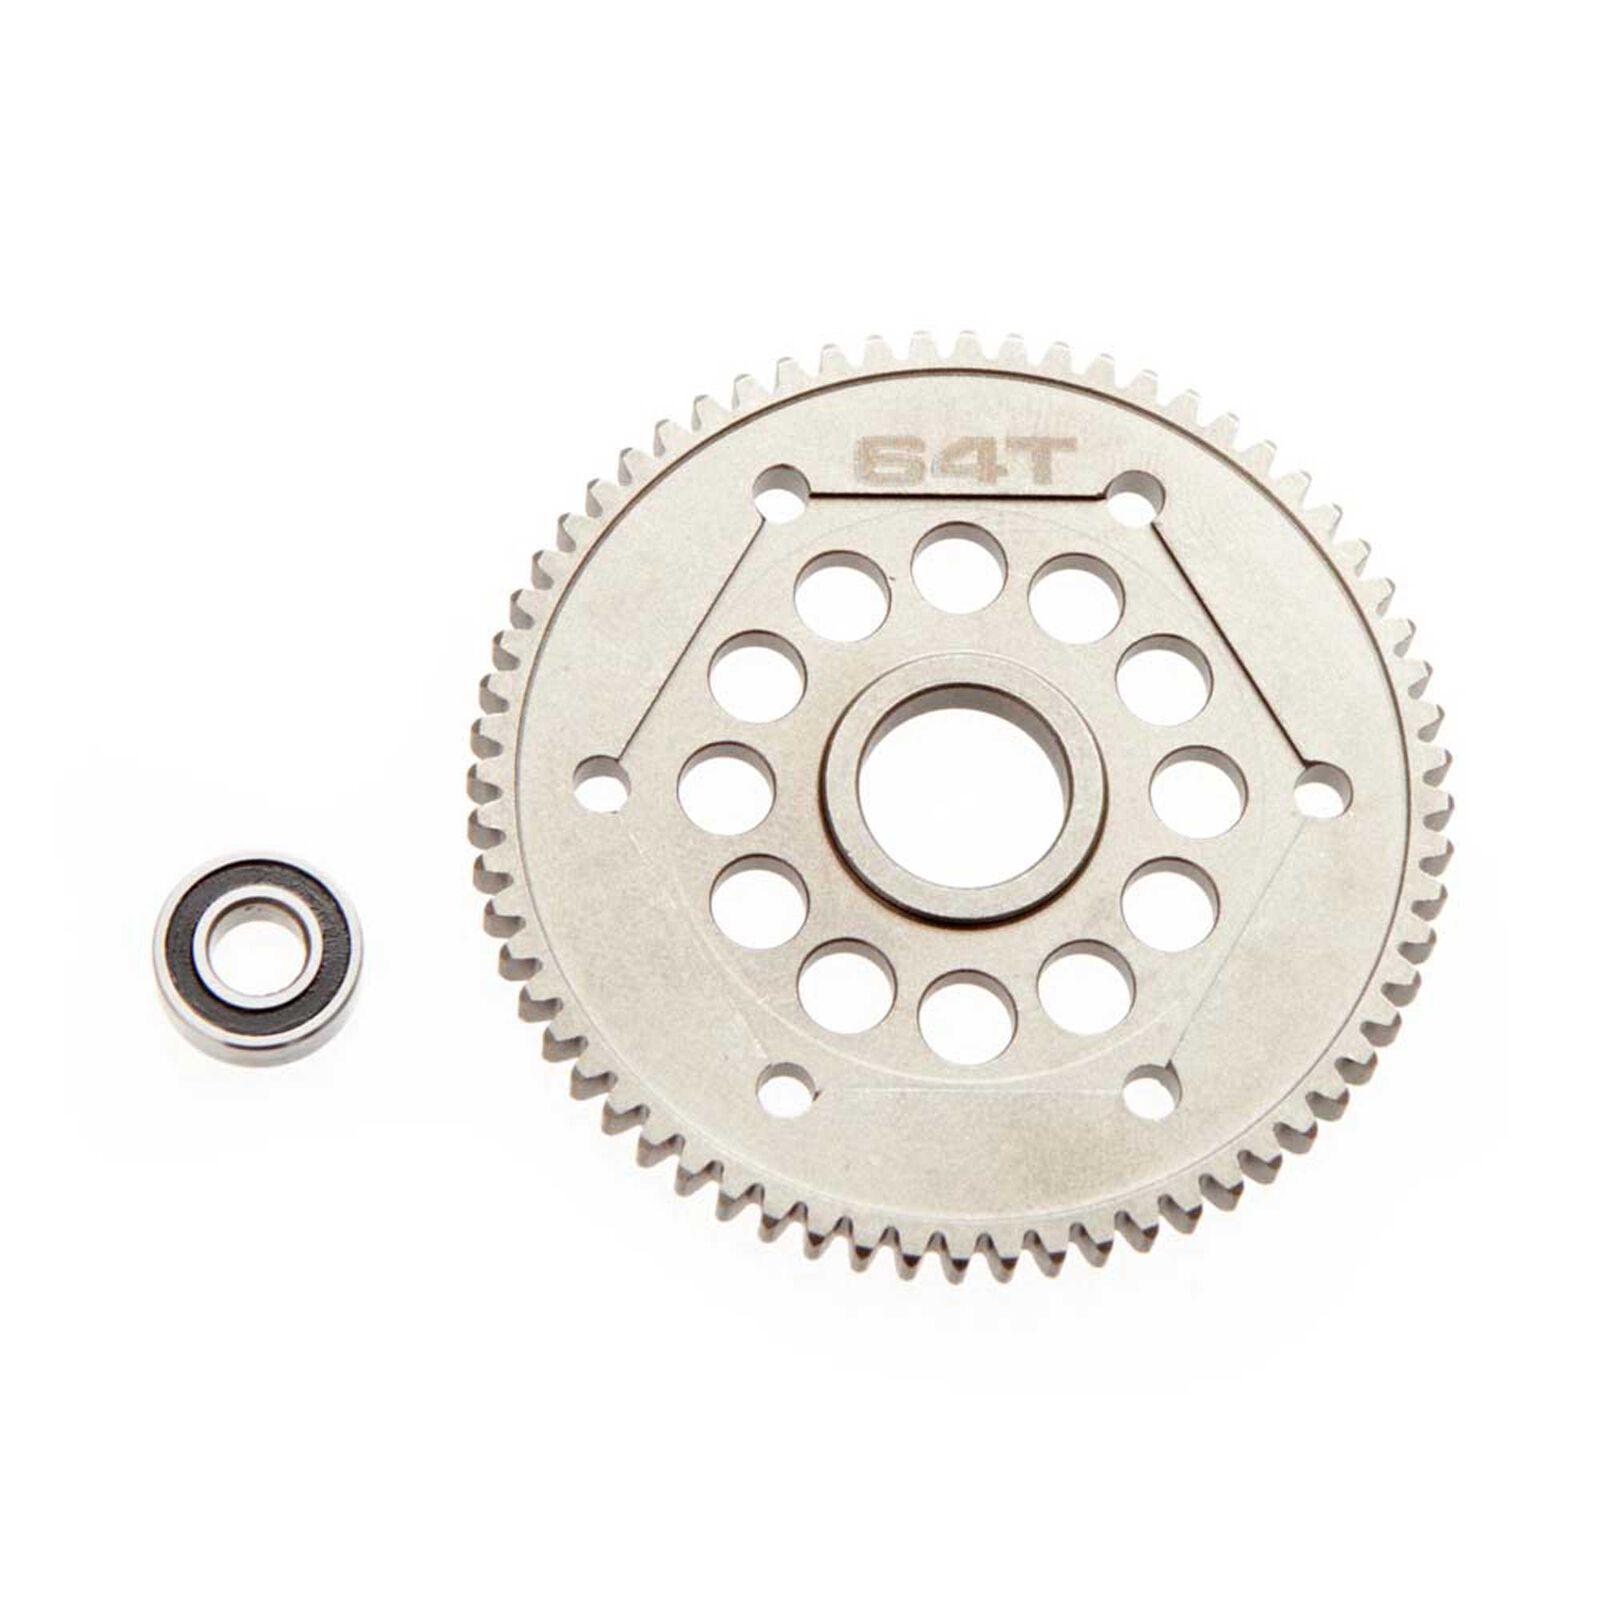 Steel Spur Gear 32P 64T Yeti